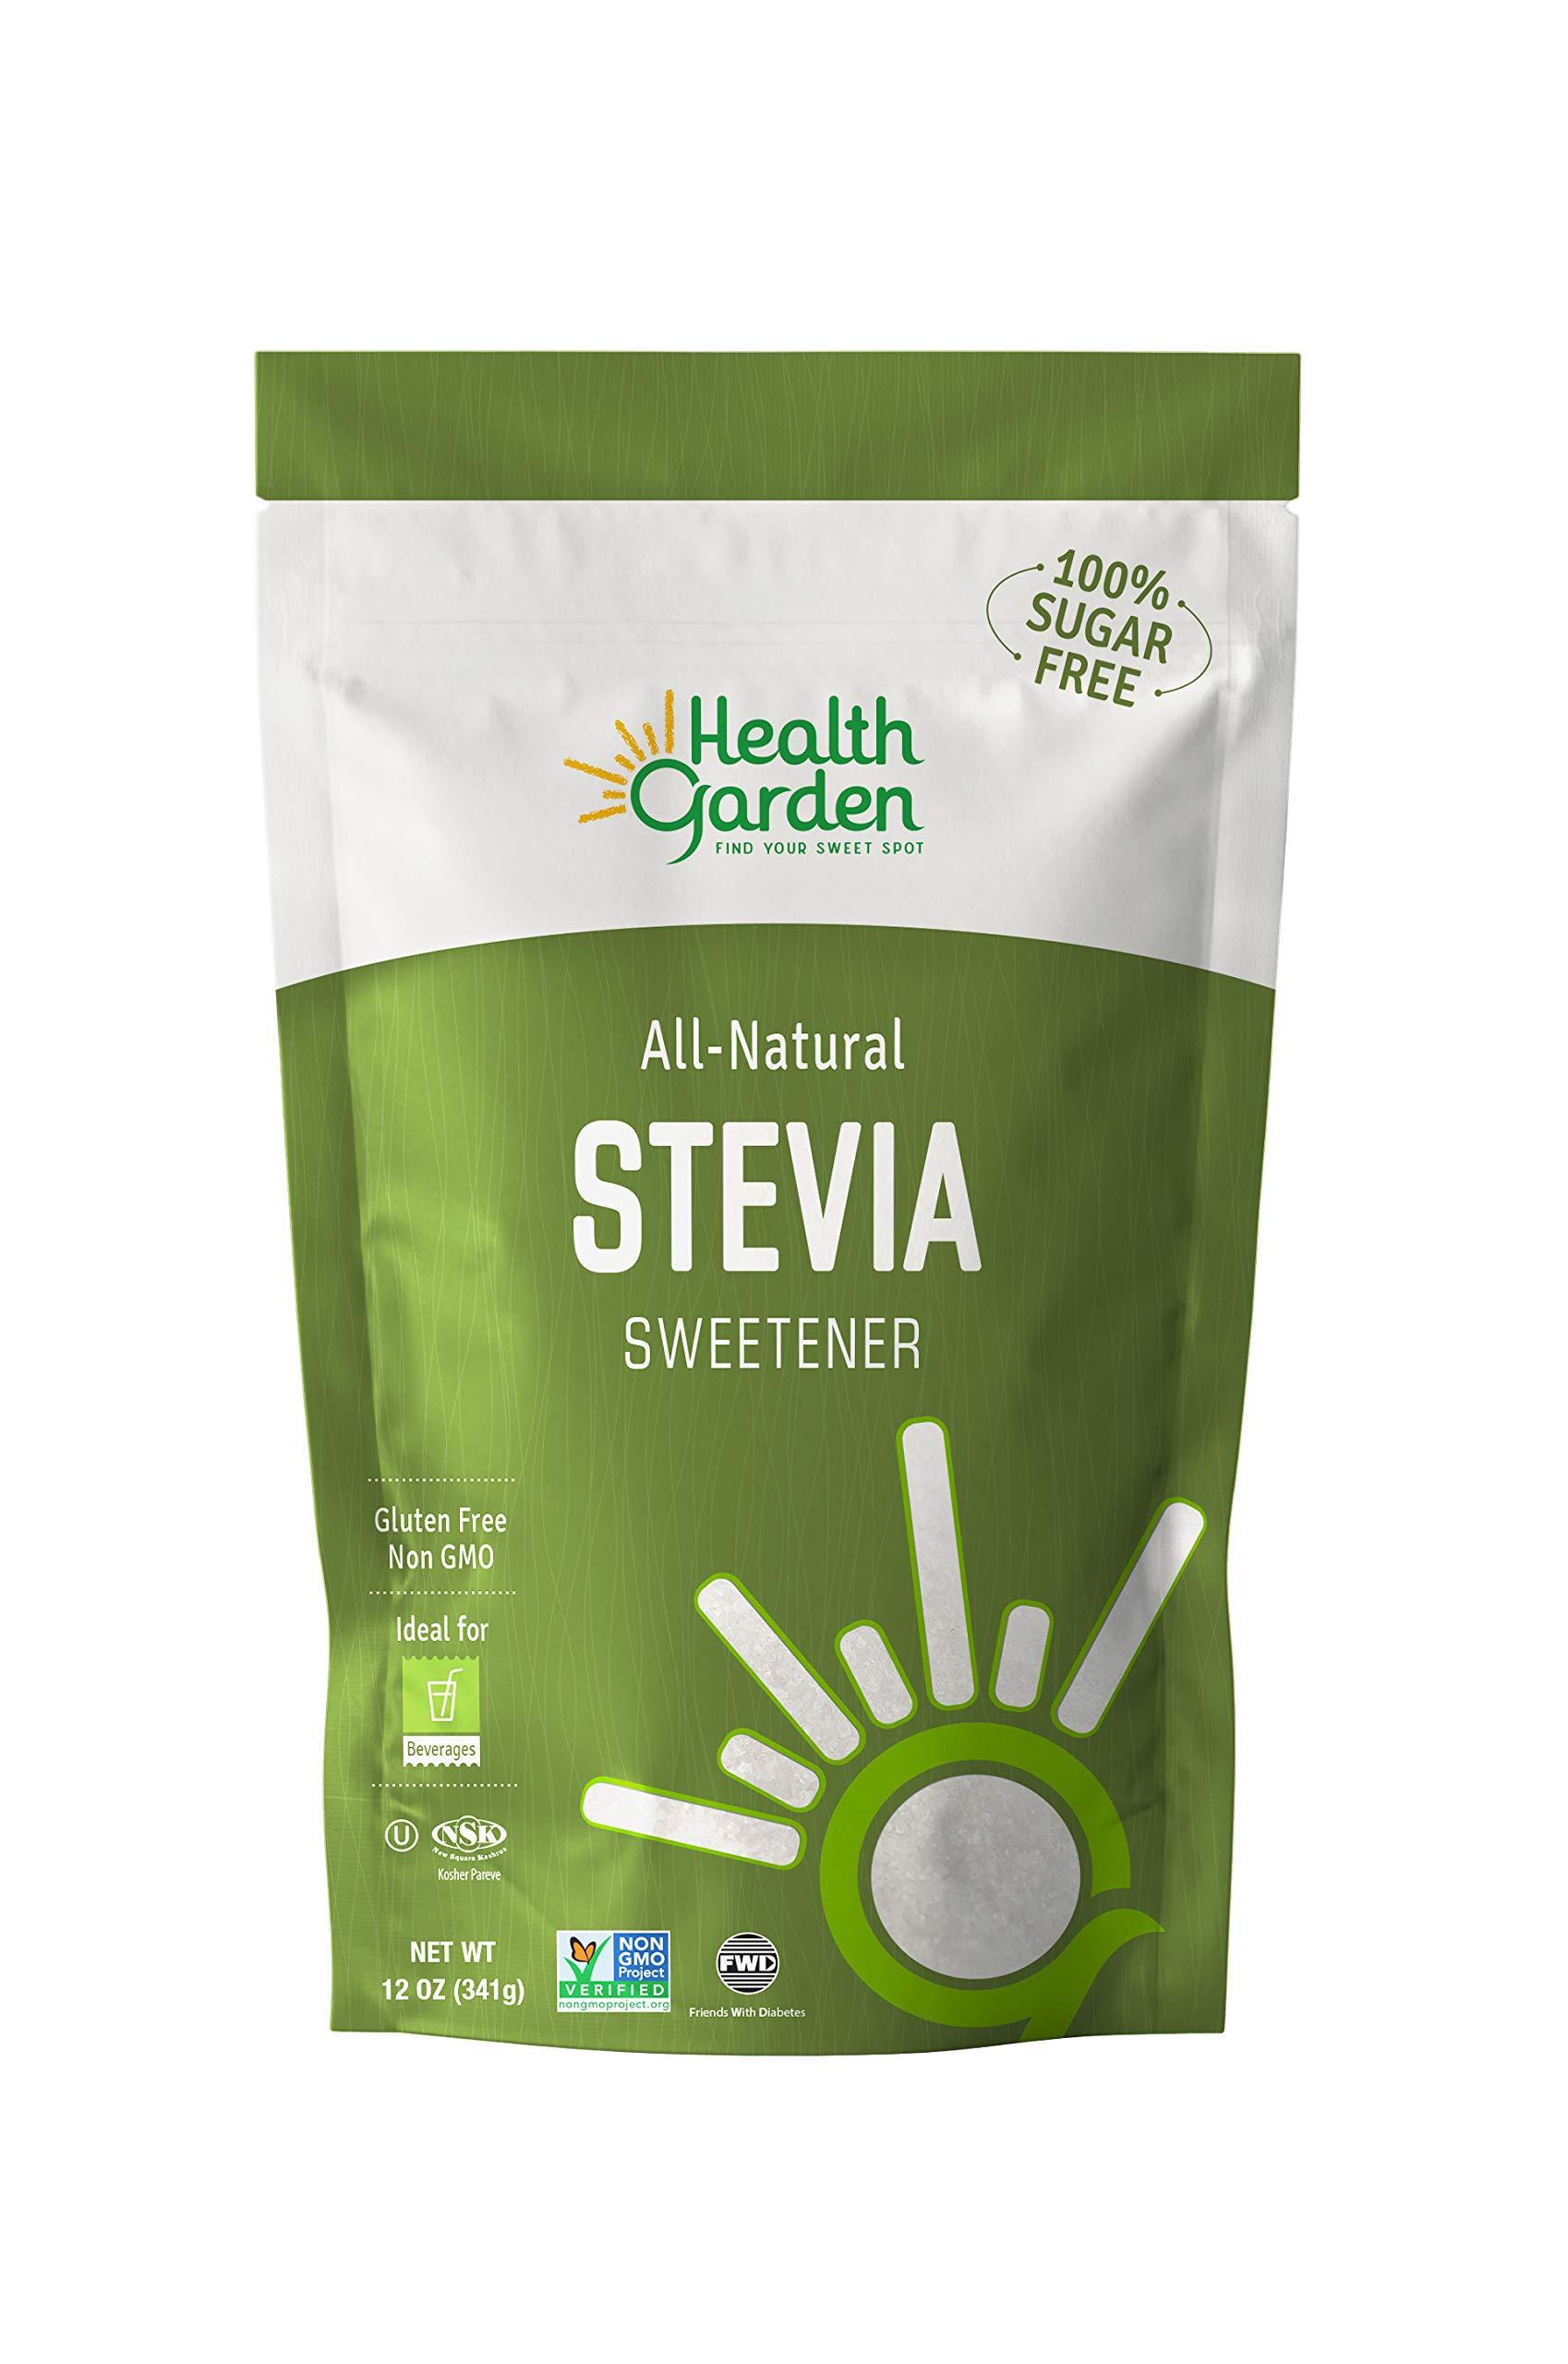 Health Garden Stevia Sweetener Powder - All Natural - Kosher - Gluten and Sugar Free - Keto Friendly (12 oz)